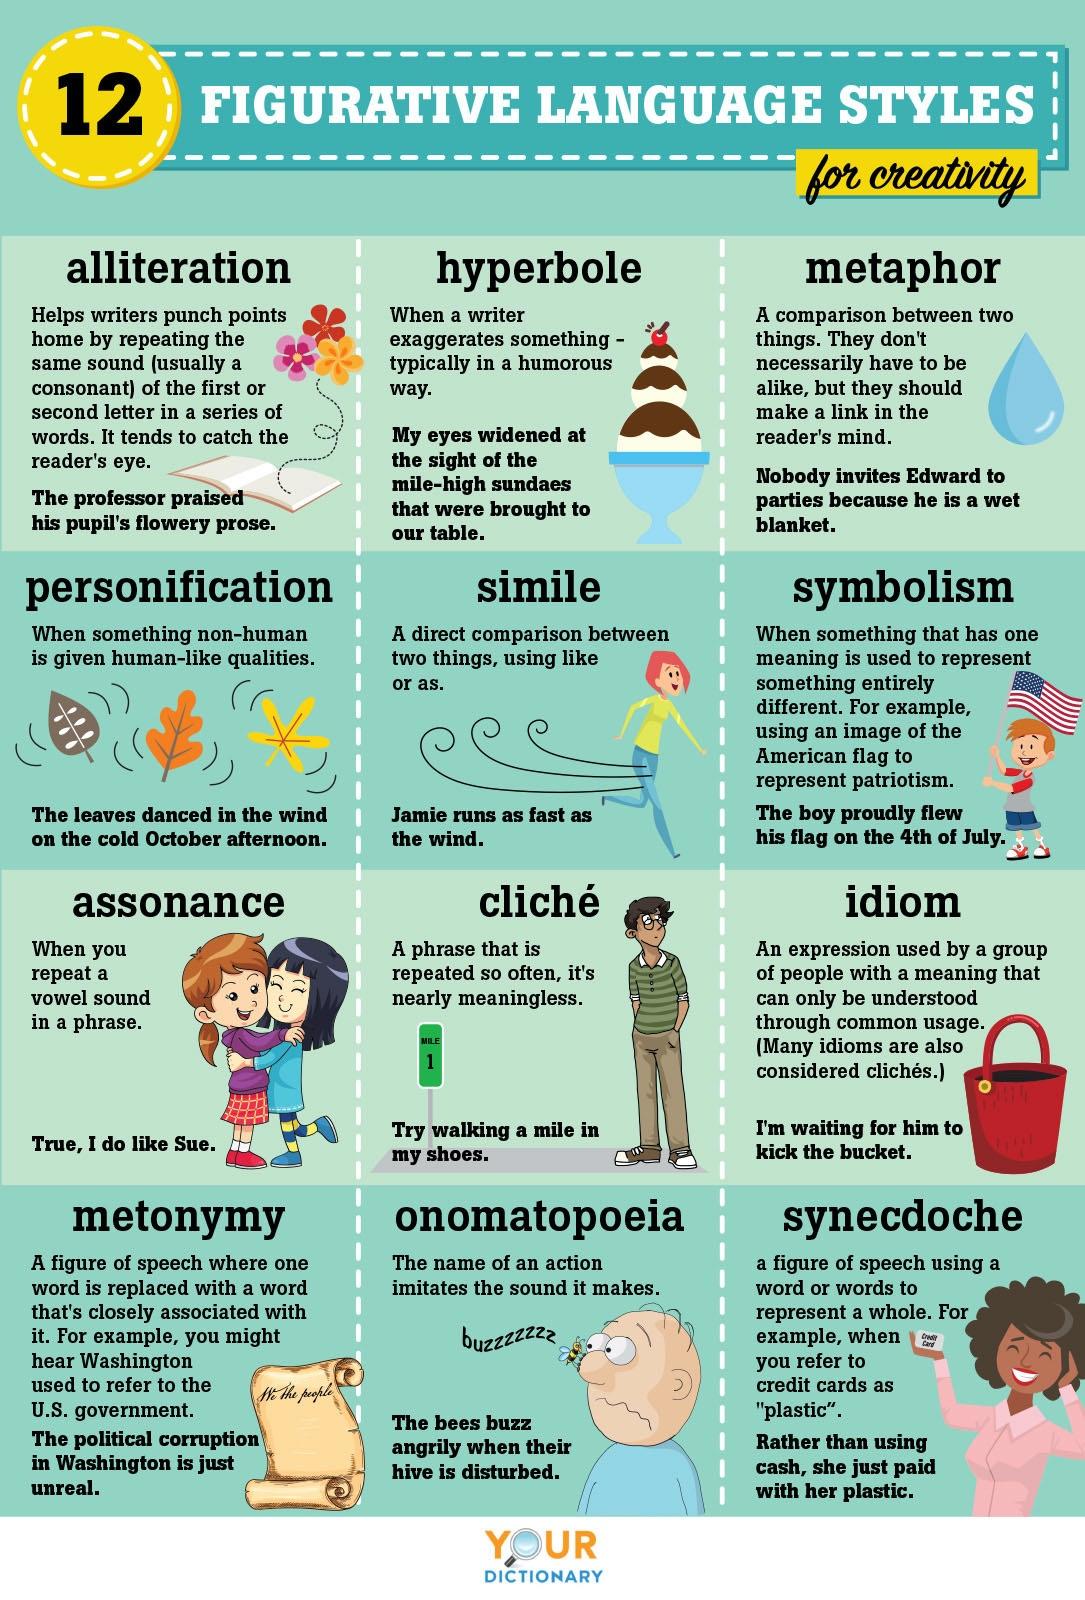 figurative language infographic